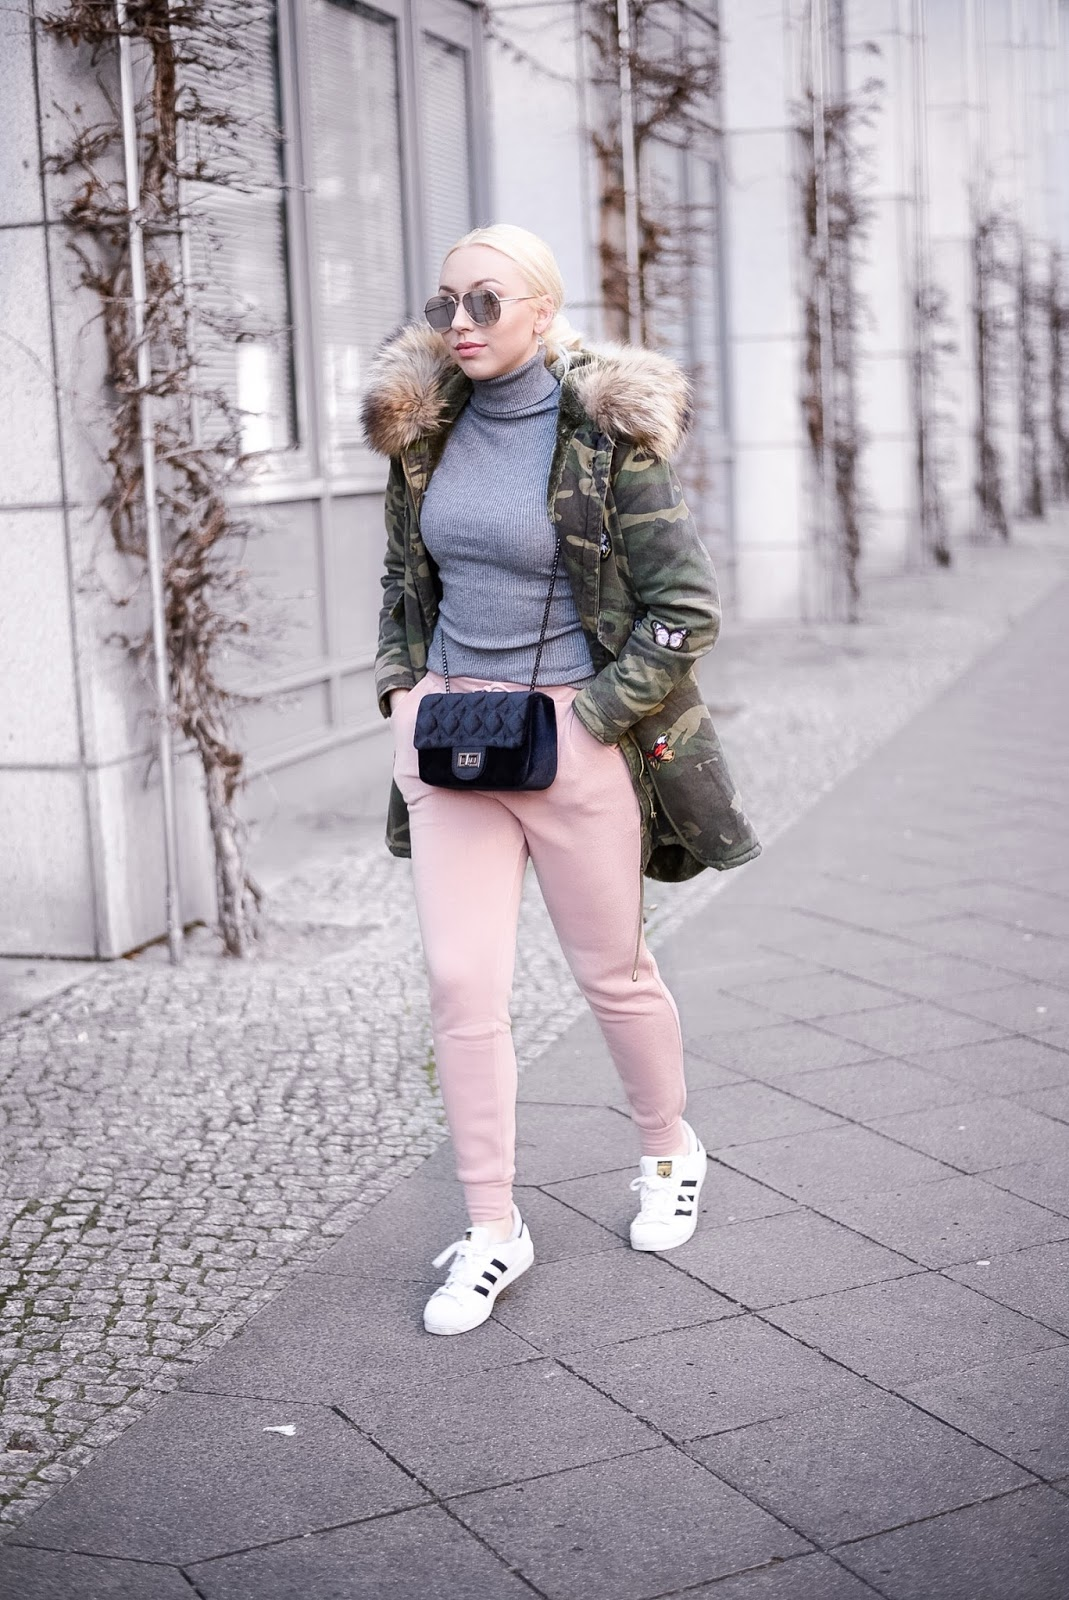 fashionblogger streetstyle_joggers_adidas superstars